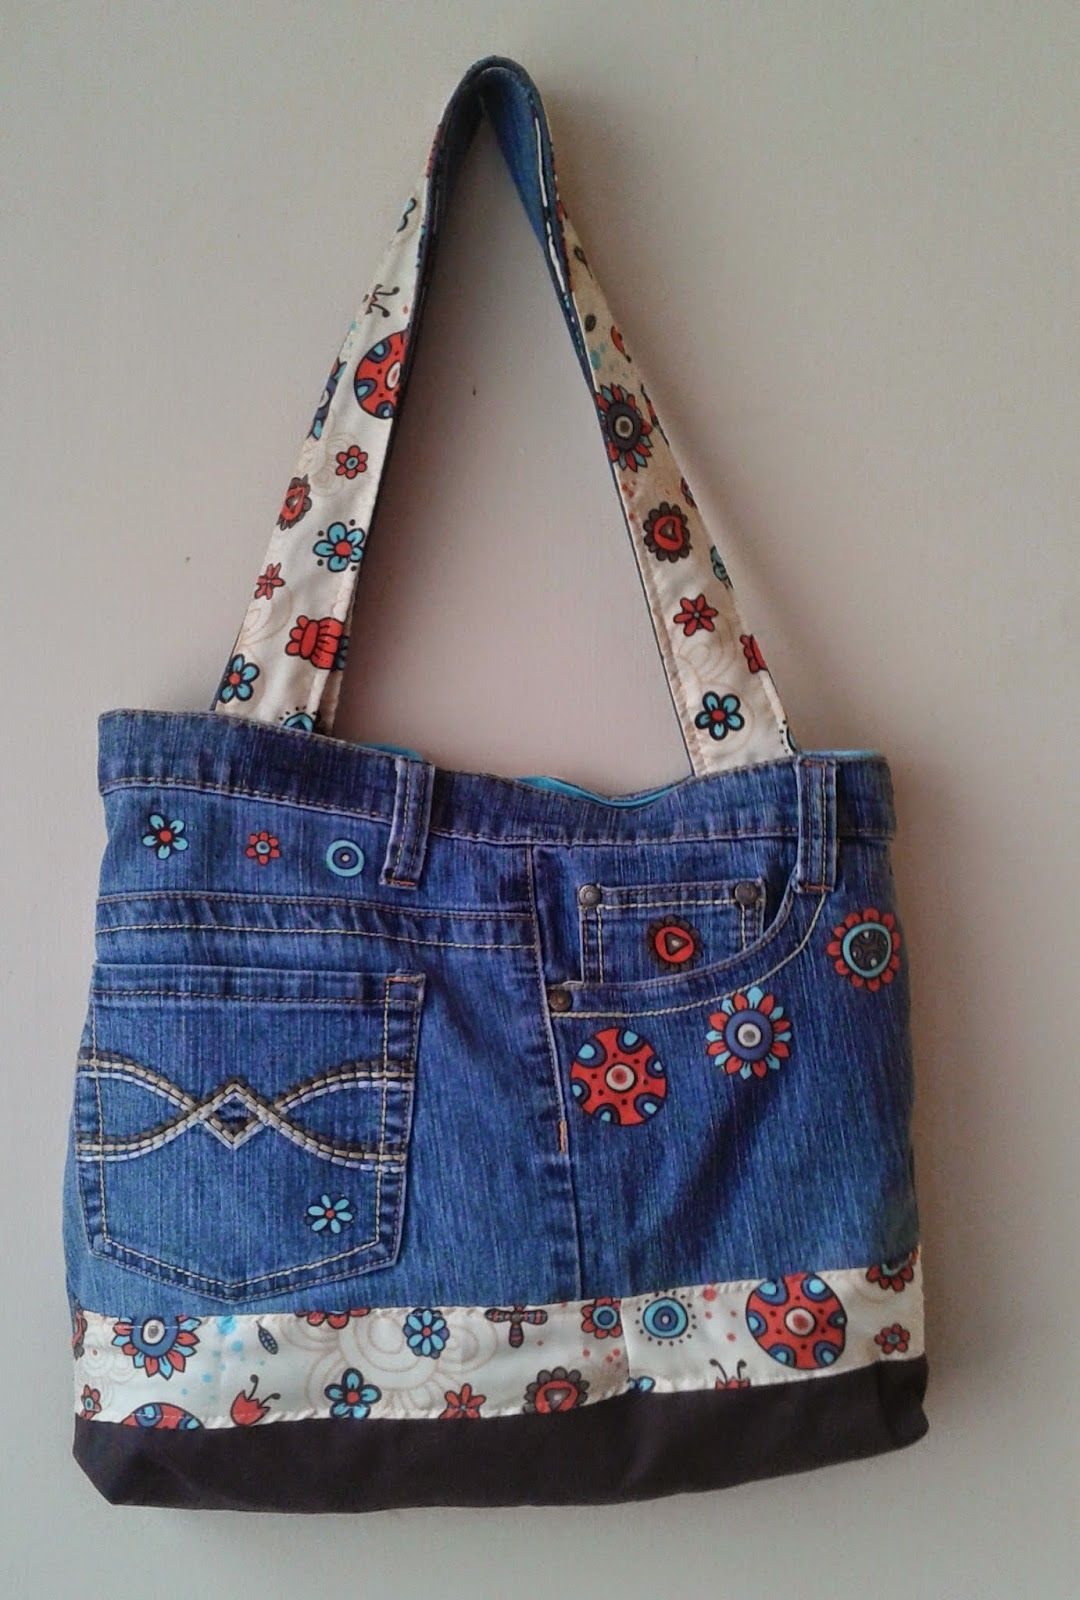 carteras de jeans reciclados ideas giya bolsos en jean reutilizado pinterest jeans. Black Bedroom Furniture Sets. Home Design Ideas